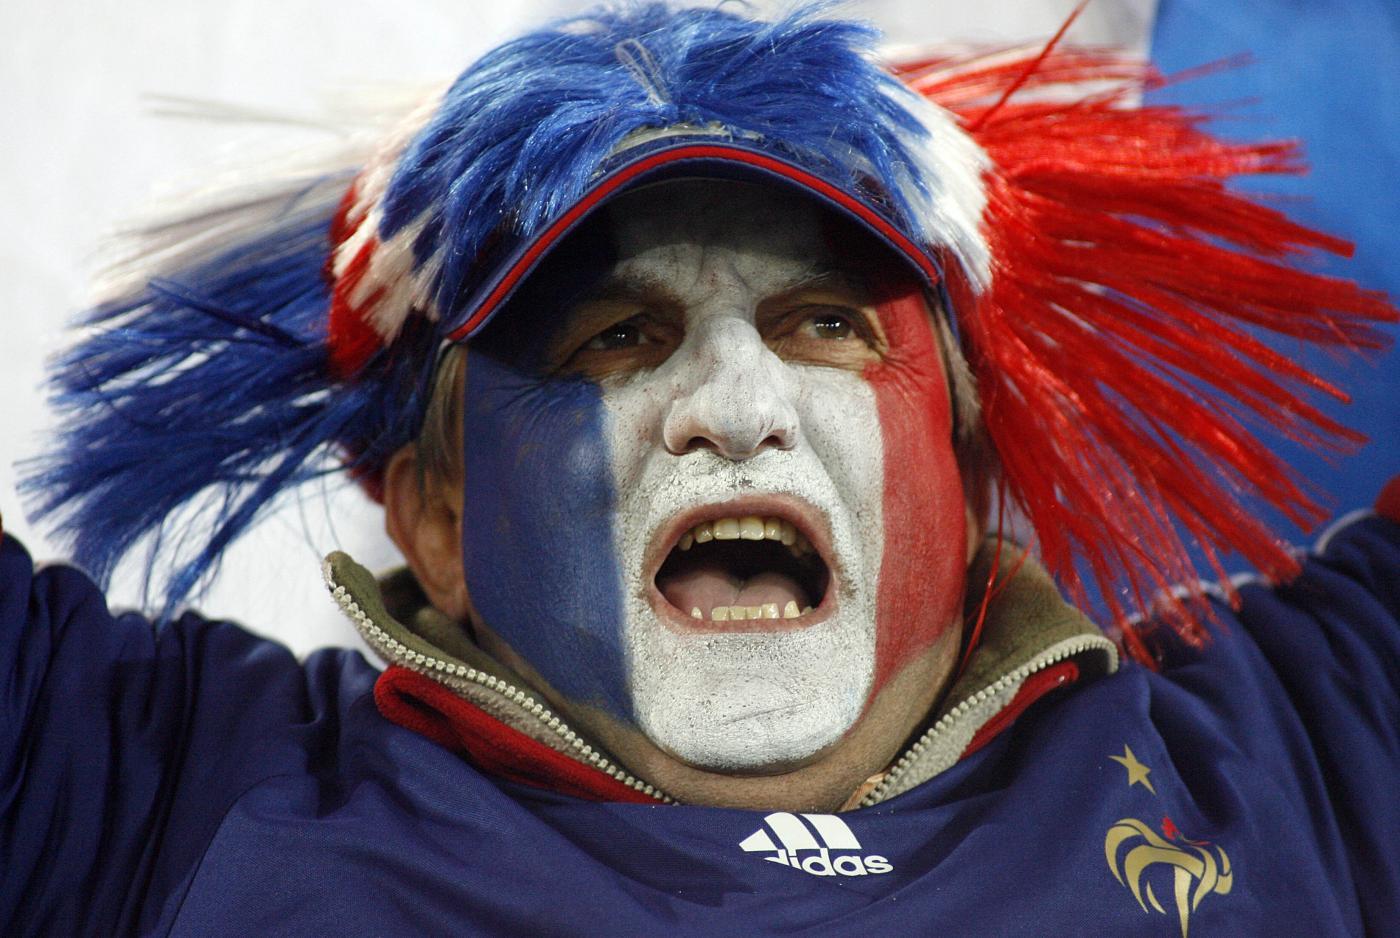 Francia National 24 novembre, analisi e pronostici